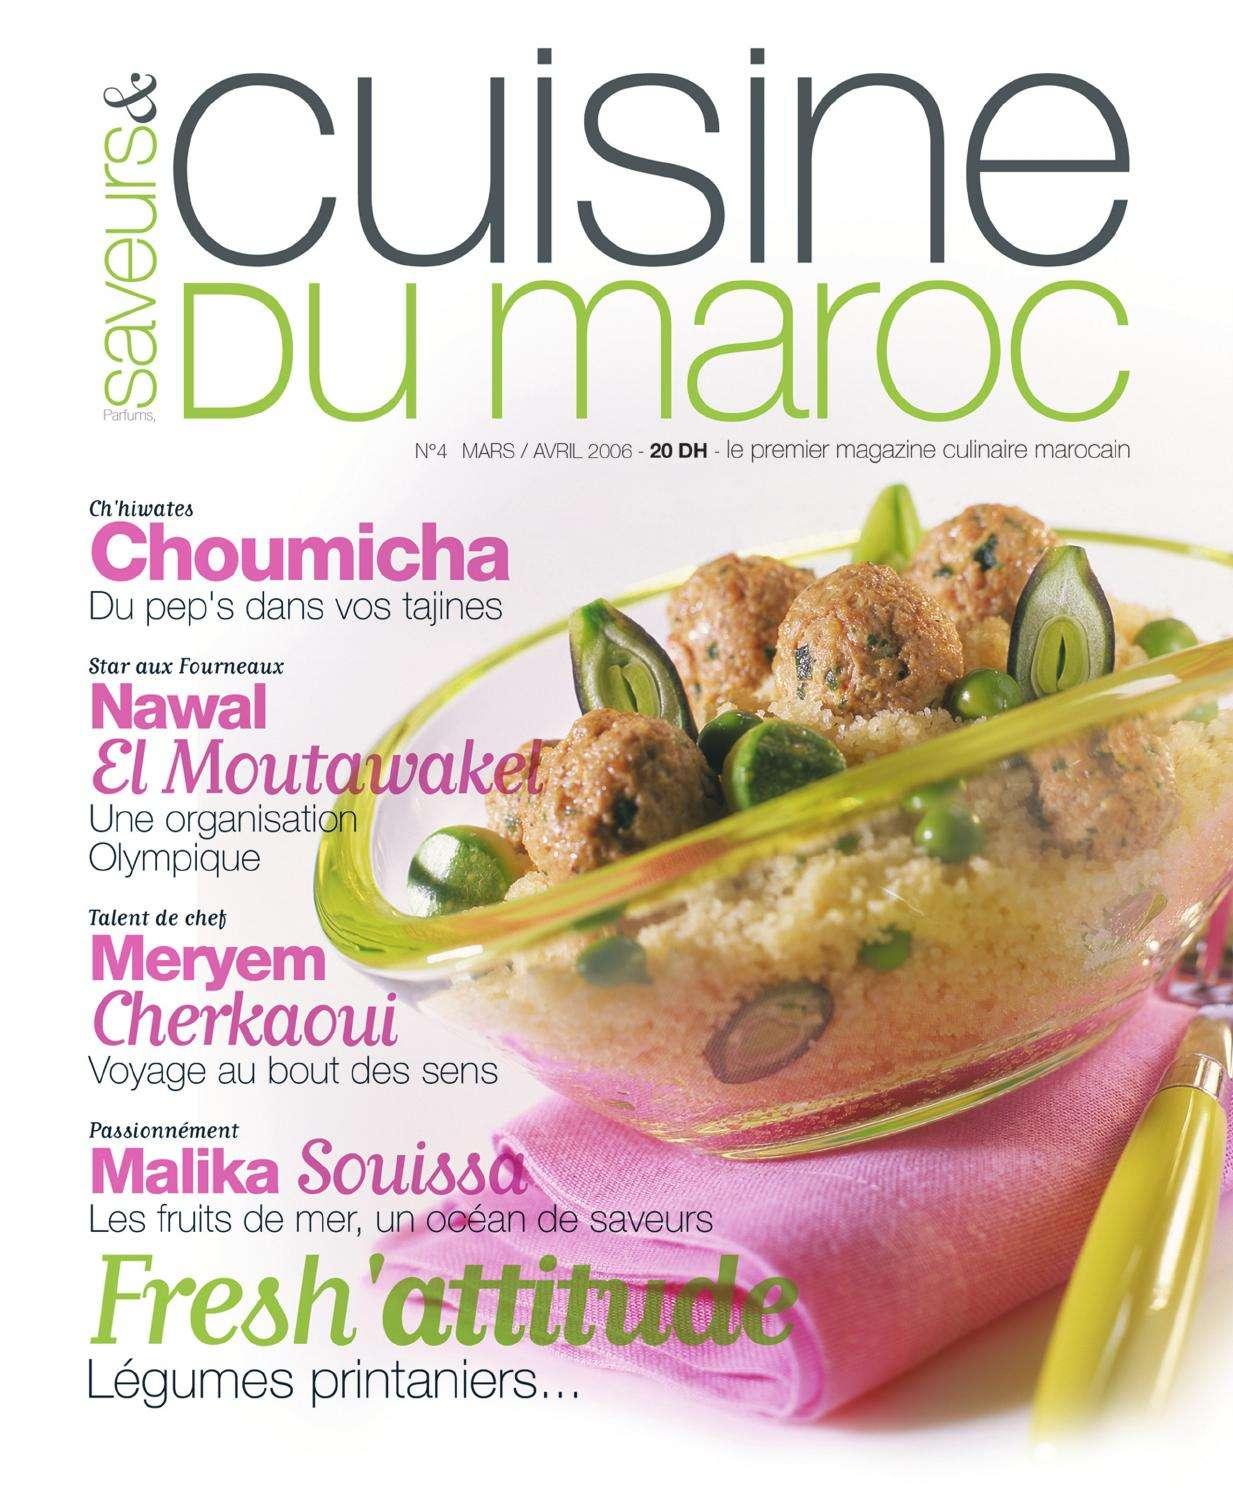 Saveur & Cuisine du maroc 4